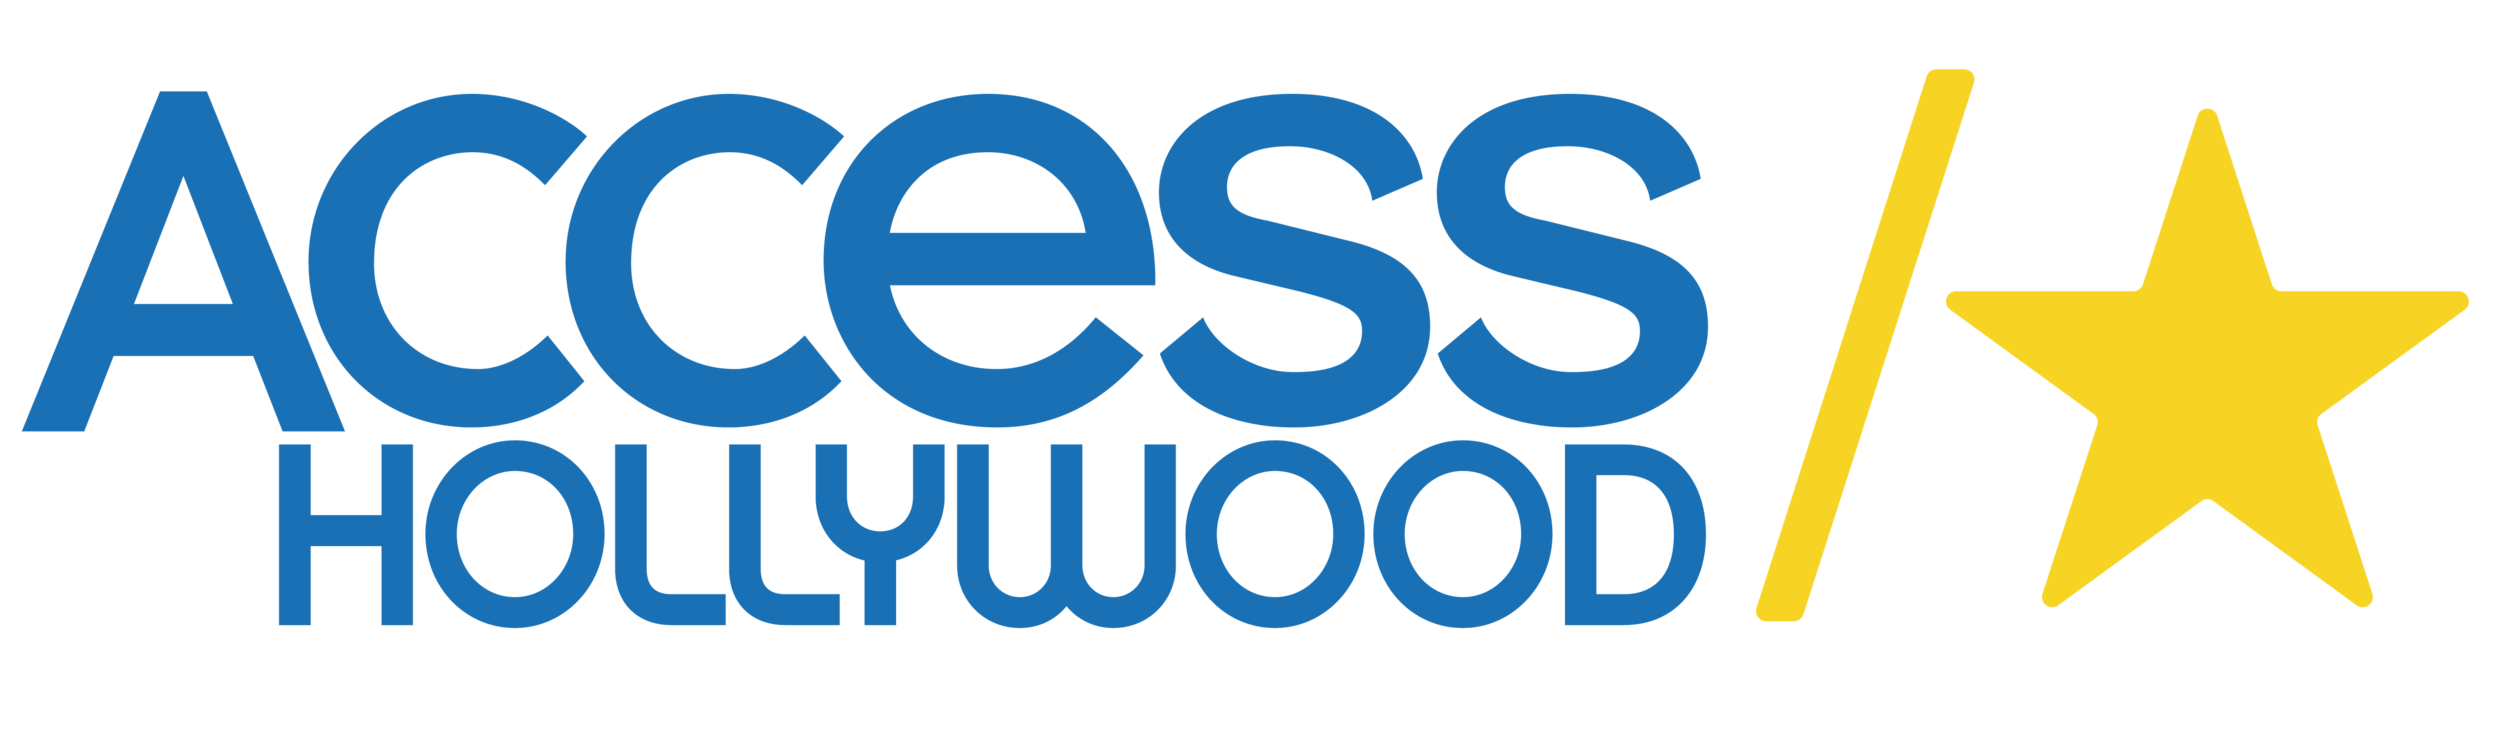 logo-access-hollywood.png